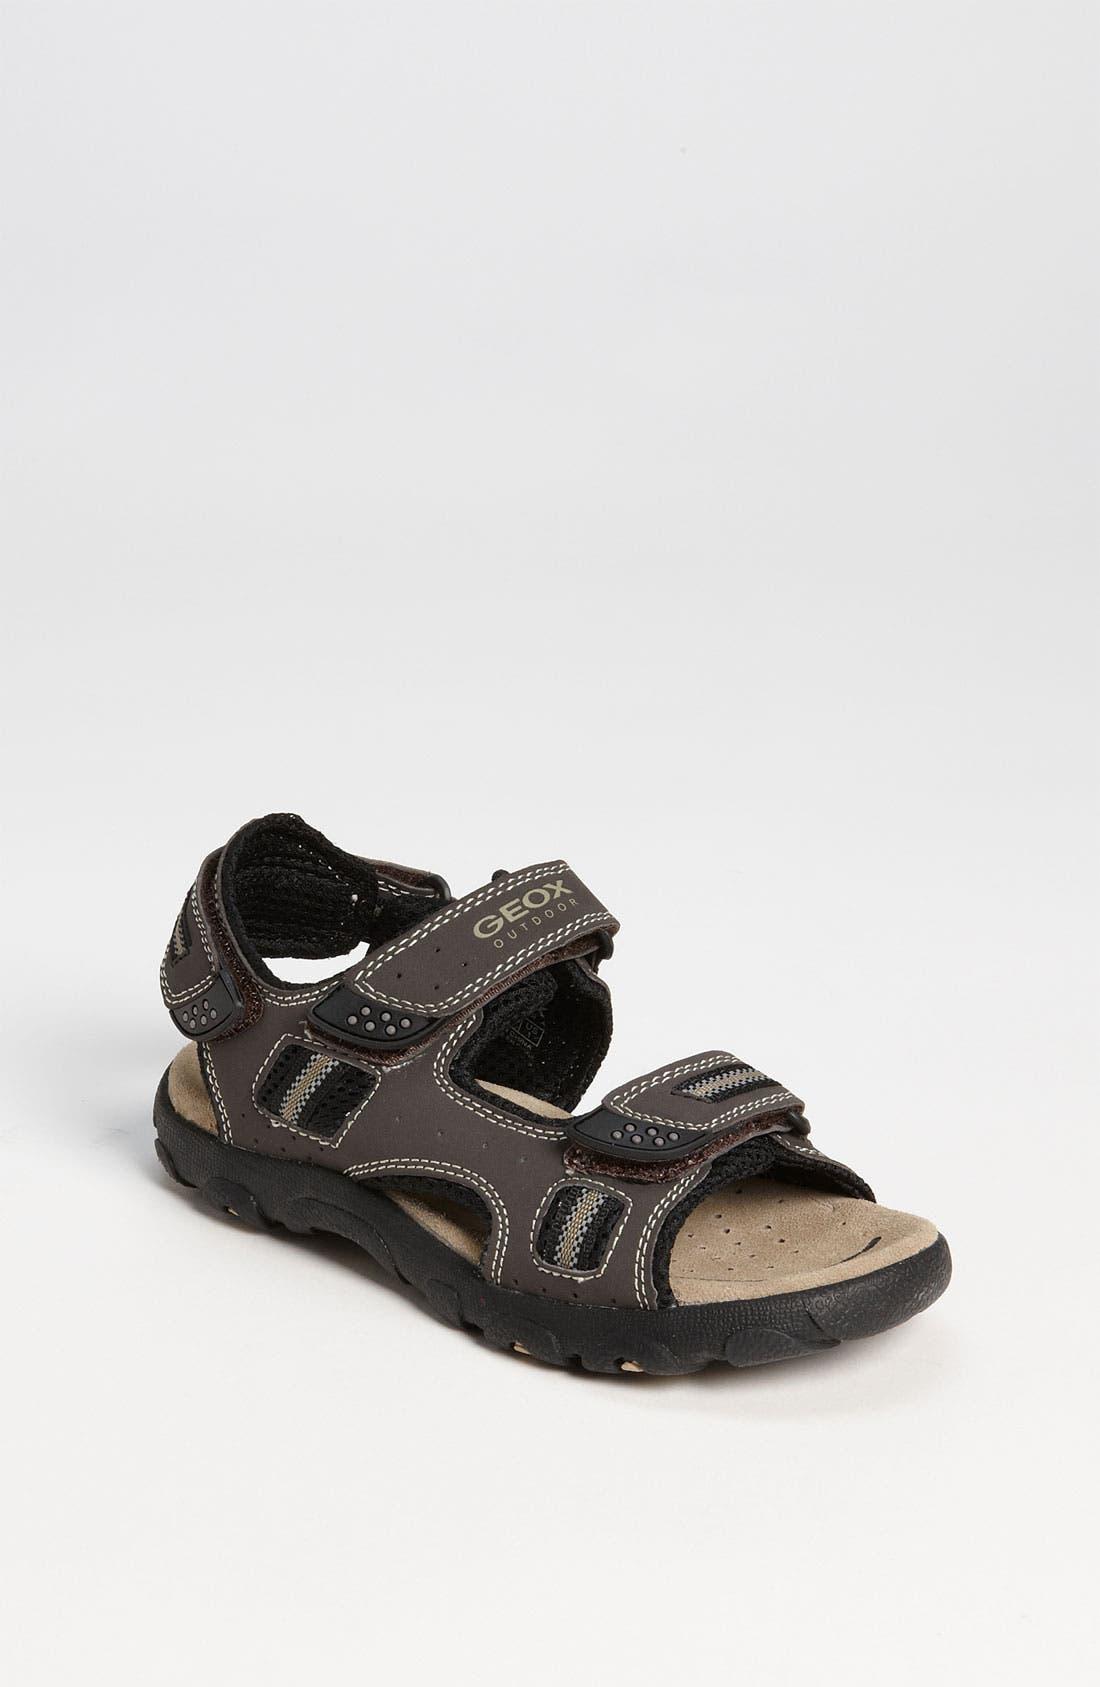 Main Image - Geox 'Strada' Sandal (Toddler, Little Kid & Big Kid)